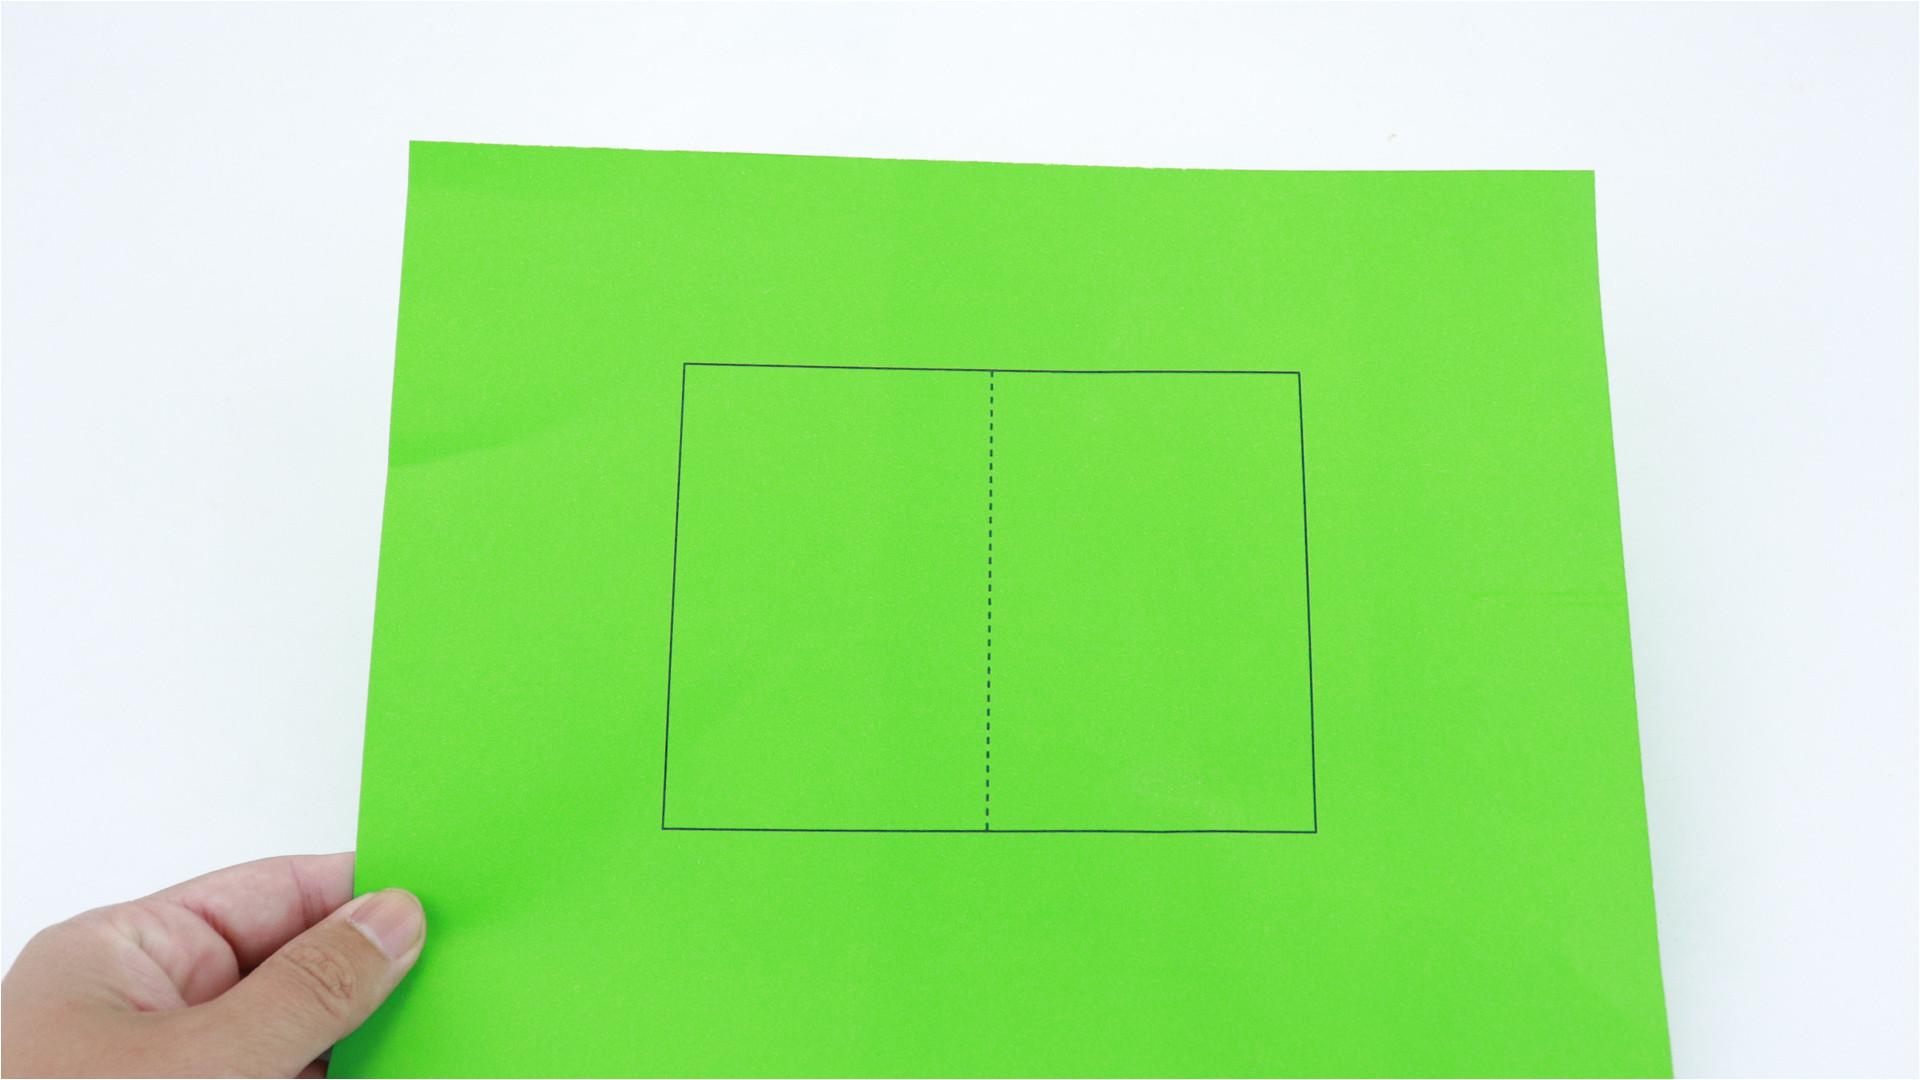 Diy Xmas Pop Up Card How to Make A Christmas Tree Pop Up Card Robert Sabuda Method